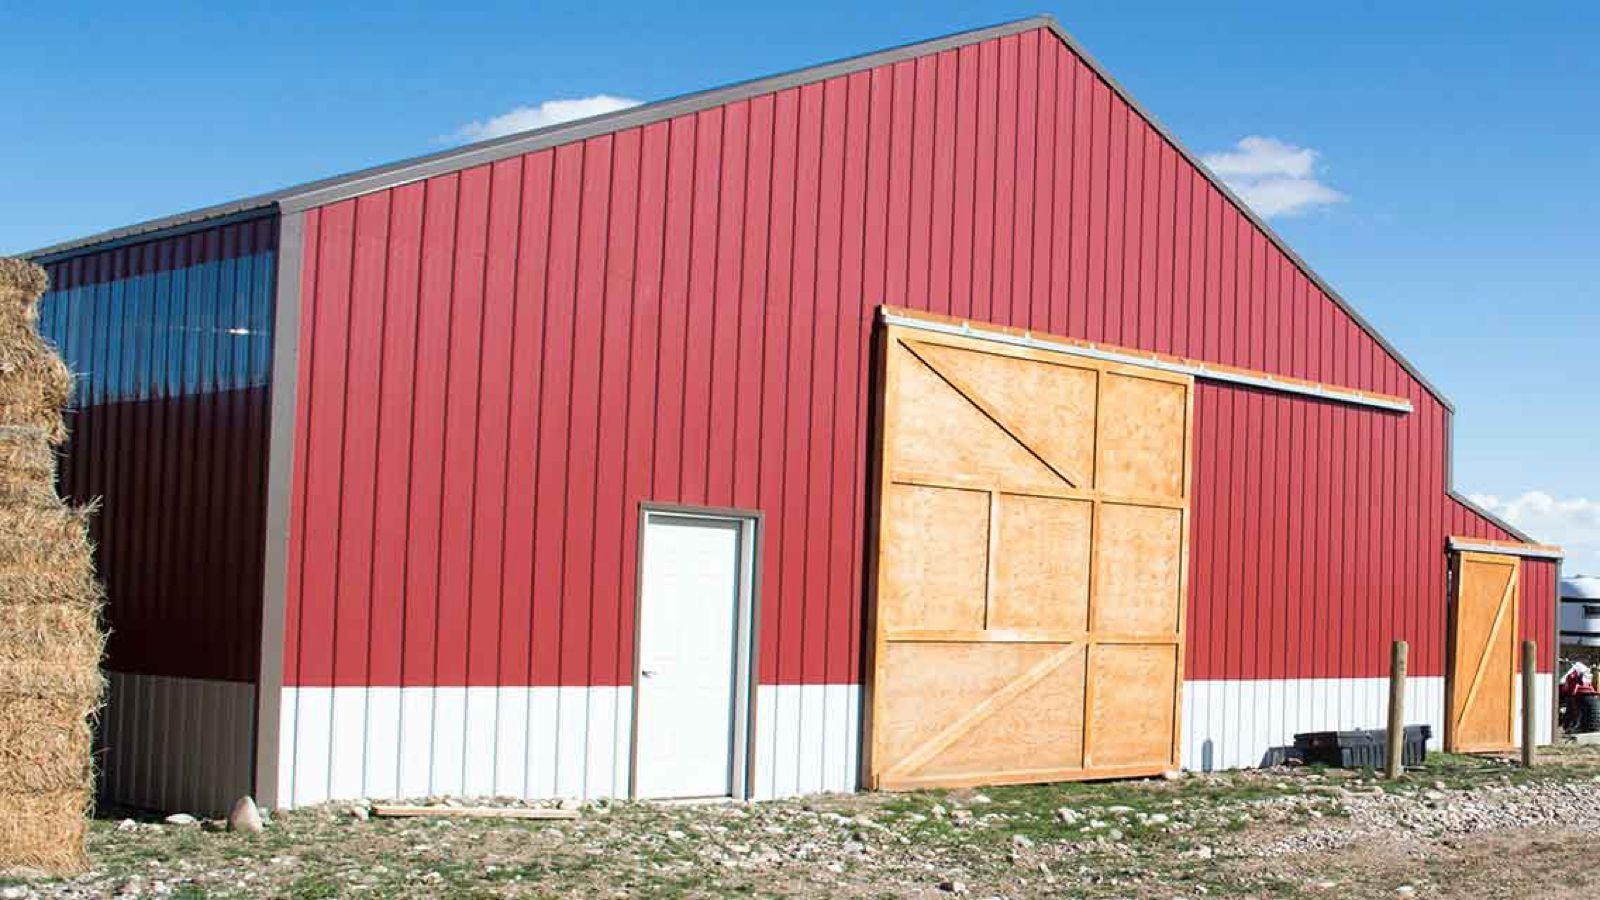 Brick Red Galvalume Desert Brown Trim Polycarbonate Clear Protectorx Series Tuff Rib Metal Roofing Siding P Sheet Metal Roofing Metal Roof Roofing